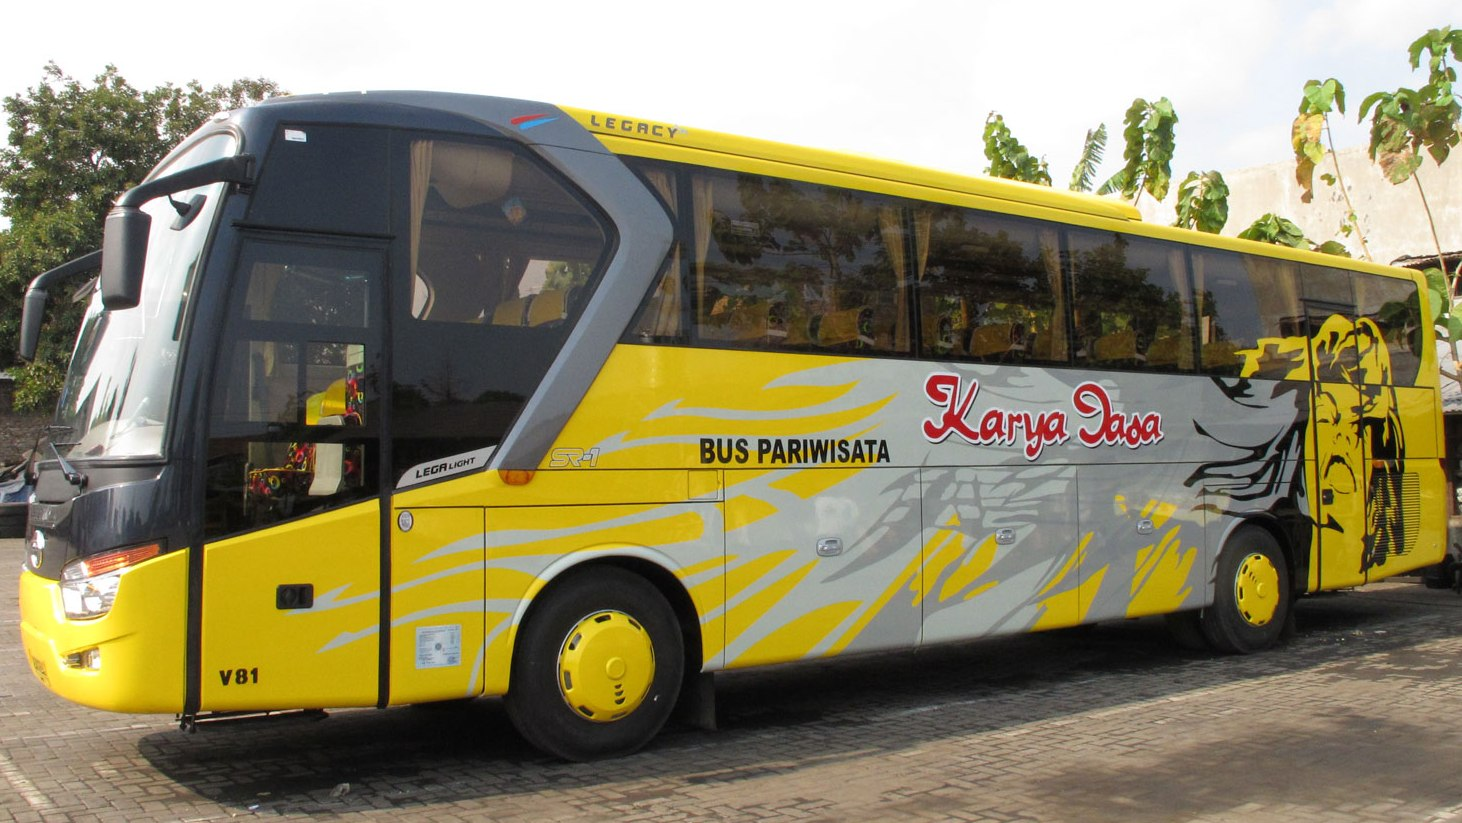 Phinisi Tour & Travel: BUS PARIWISATA, Disewakan